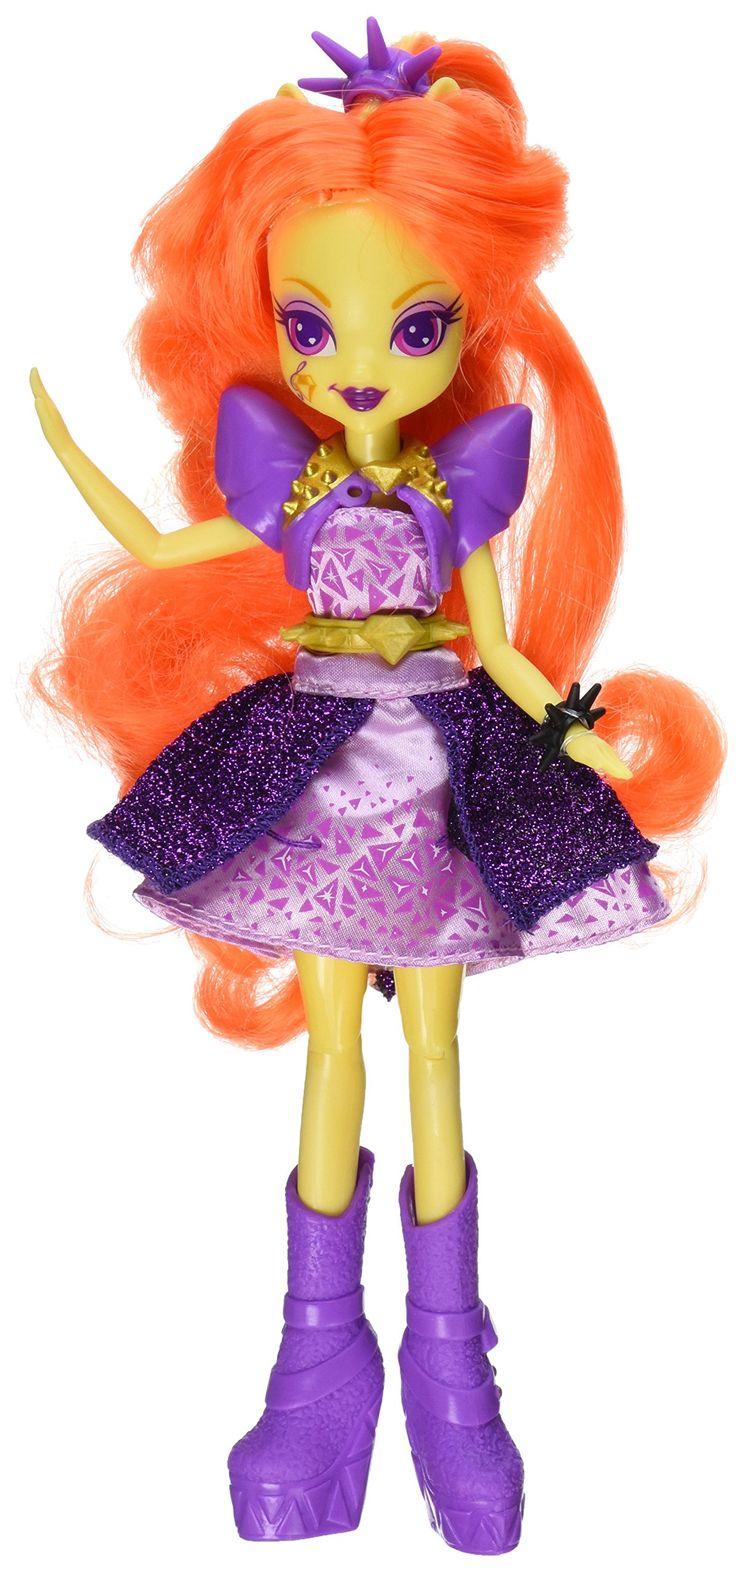 Best My Little Ponys Equestria Girls Images On Pinterest - Rockin hairstyles dolls